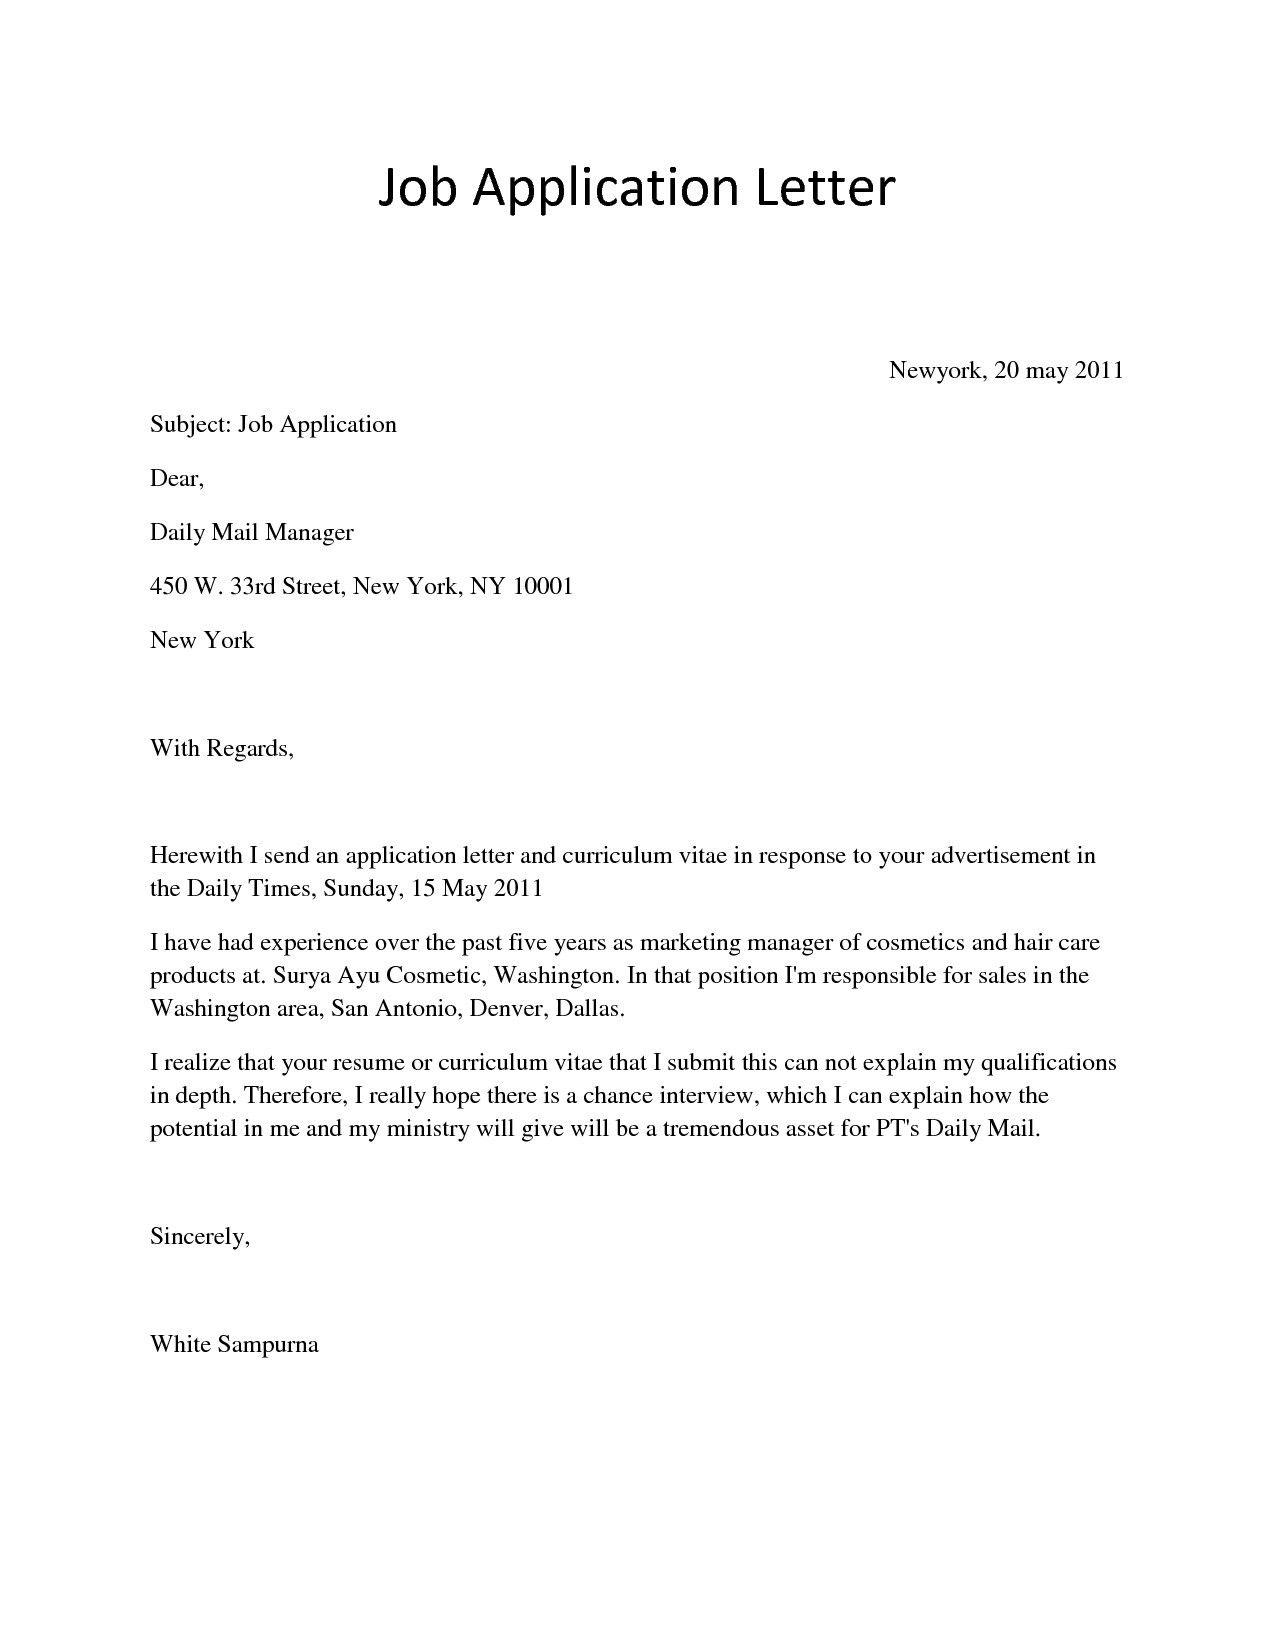 Pin on Job application